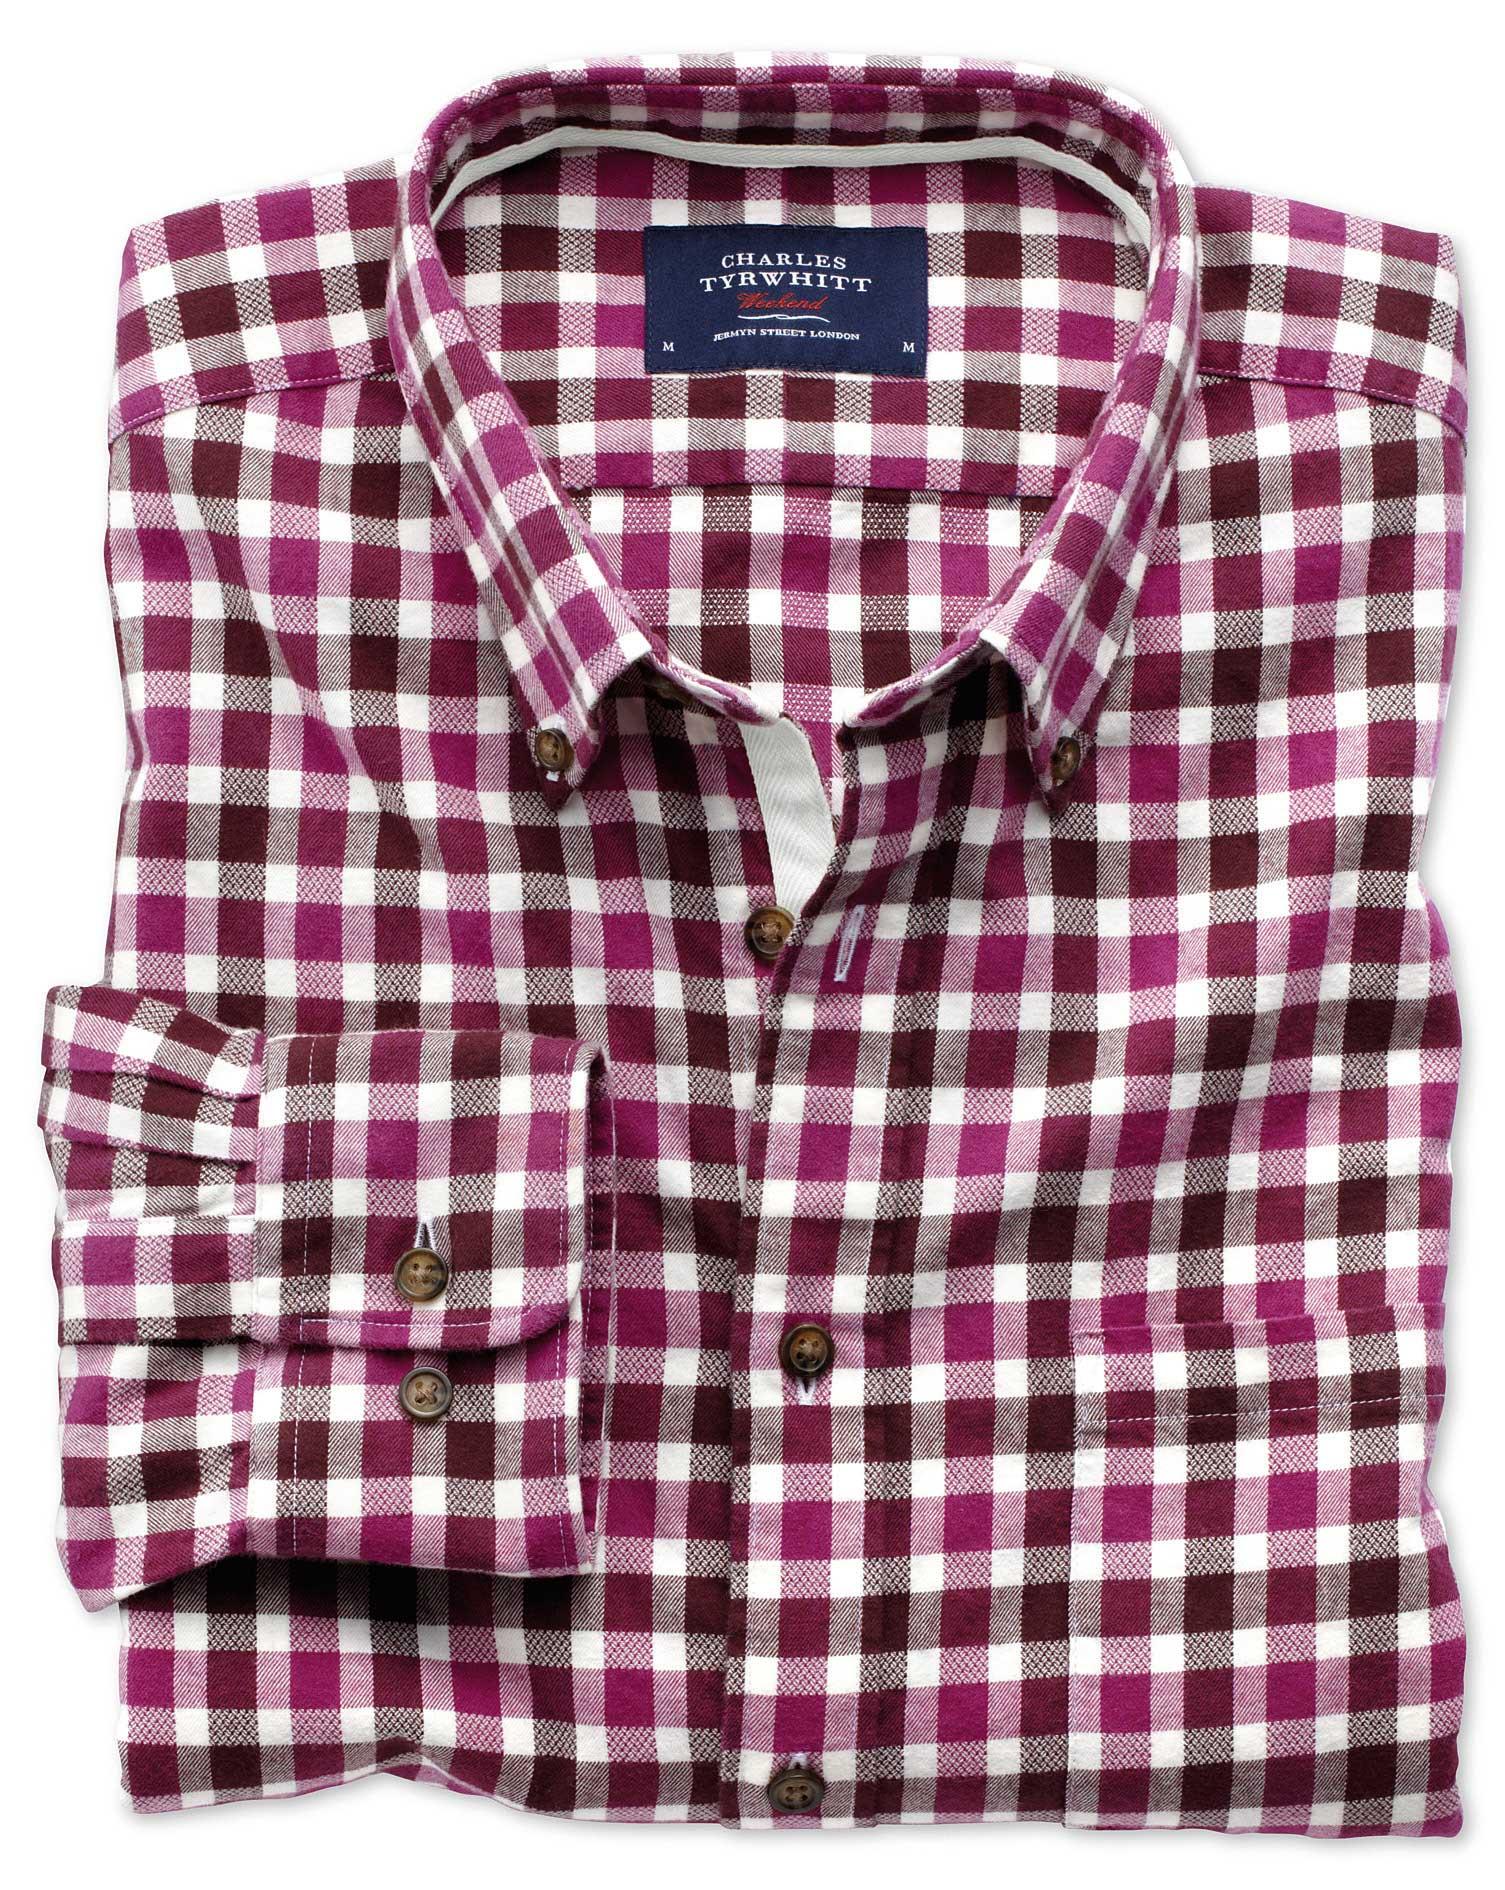 Extra Slim Fit Berry Check Brushed Dobby Cotton Shirt Single Cuff Size Medium by Charles Tyrwhitt